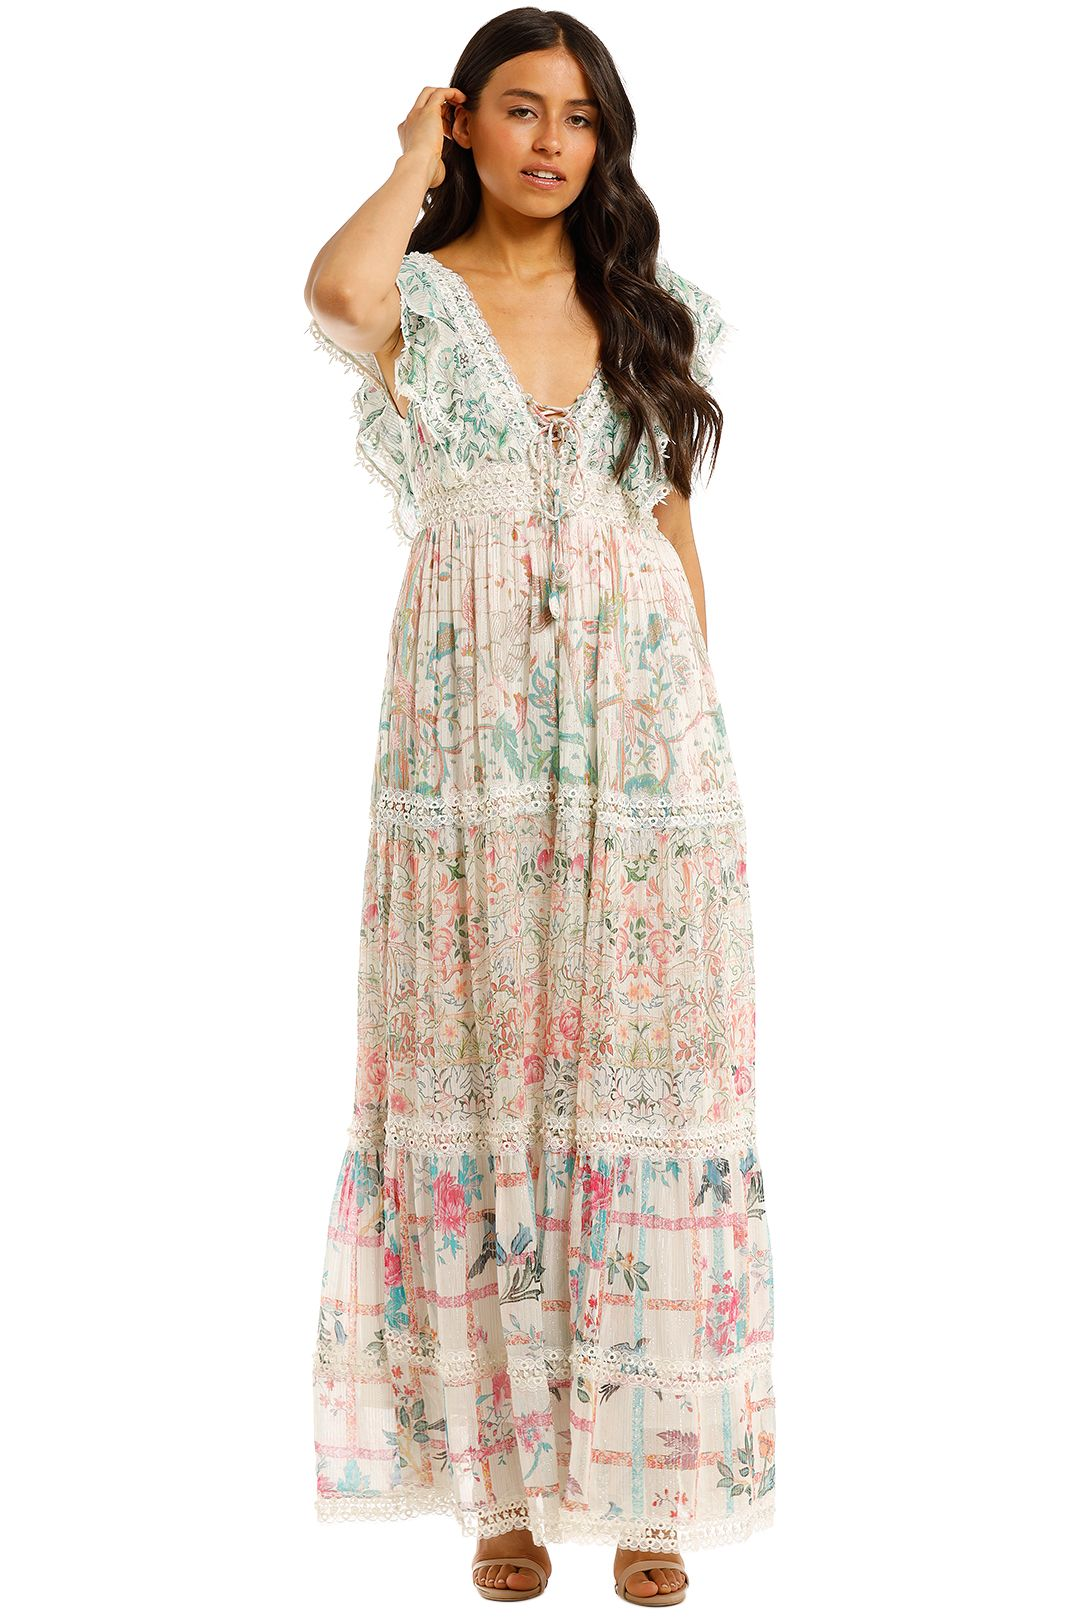 Hemant-Nandita-Cosmic-Maxi-Dress-Print-Front